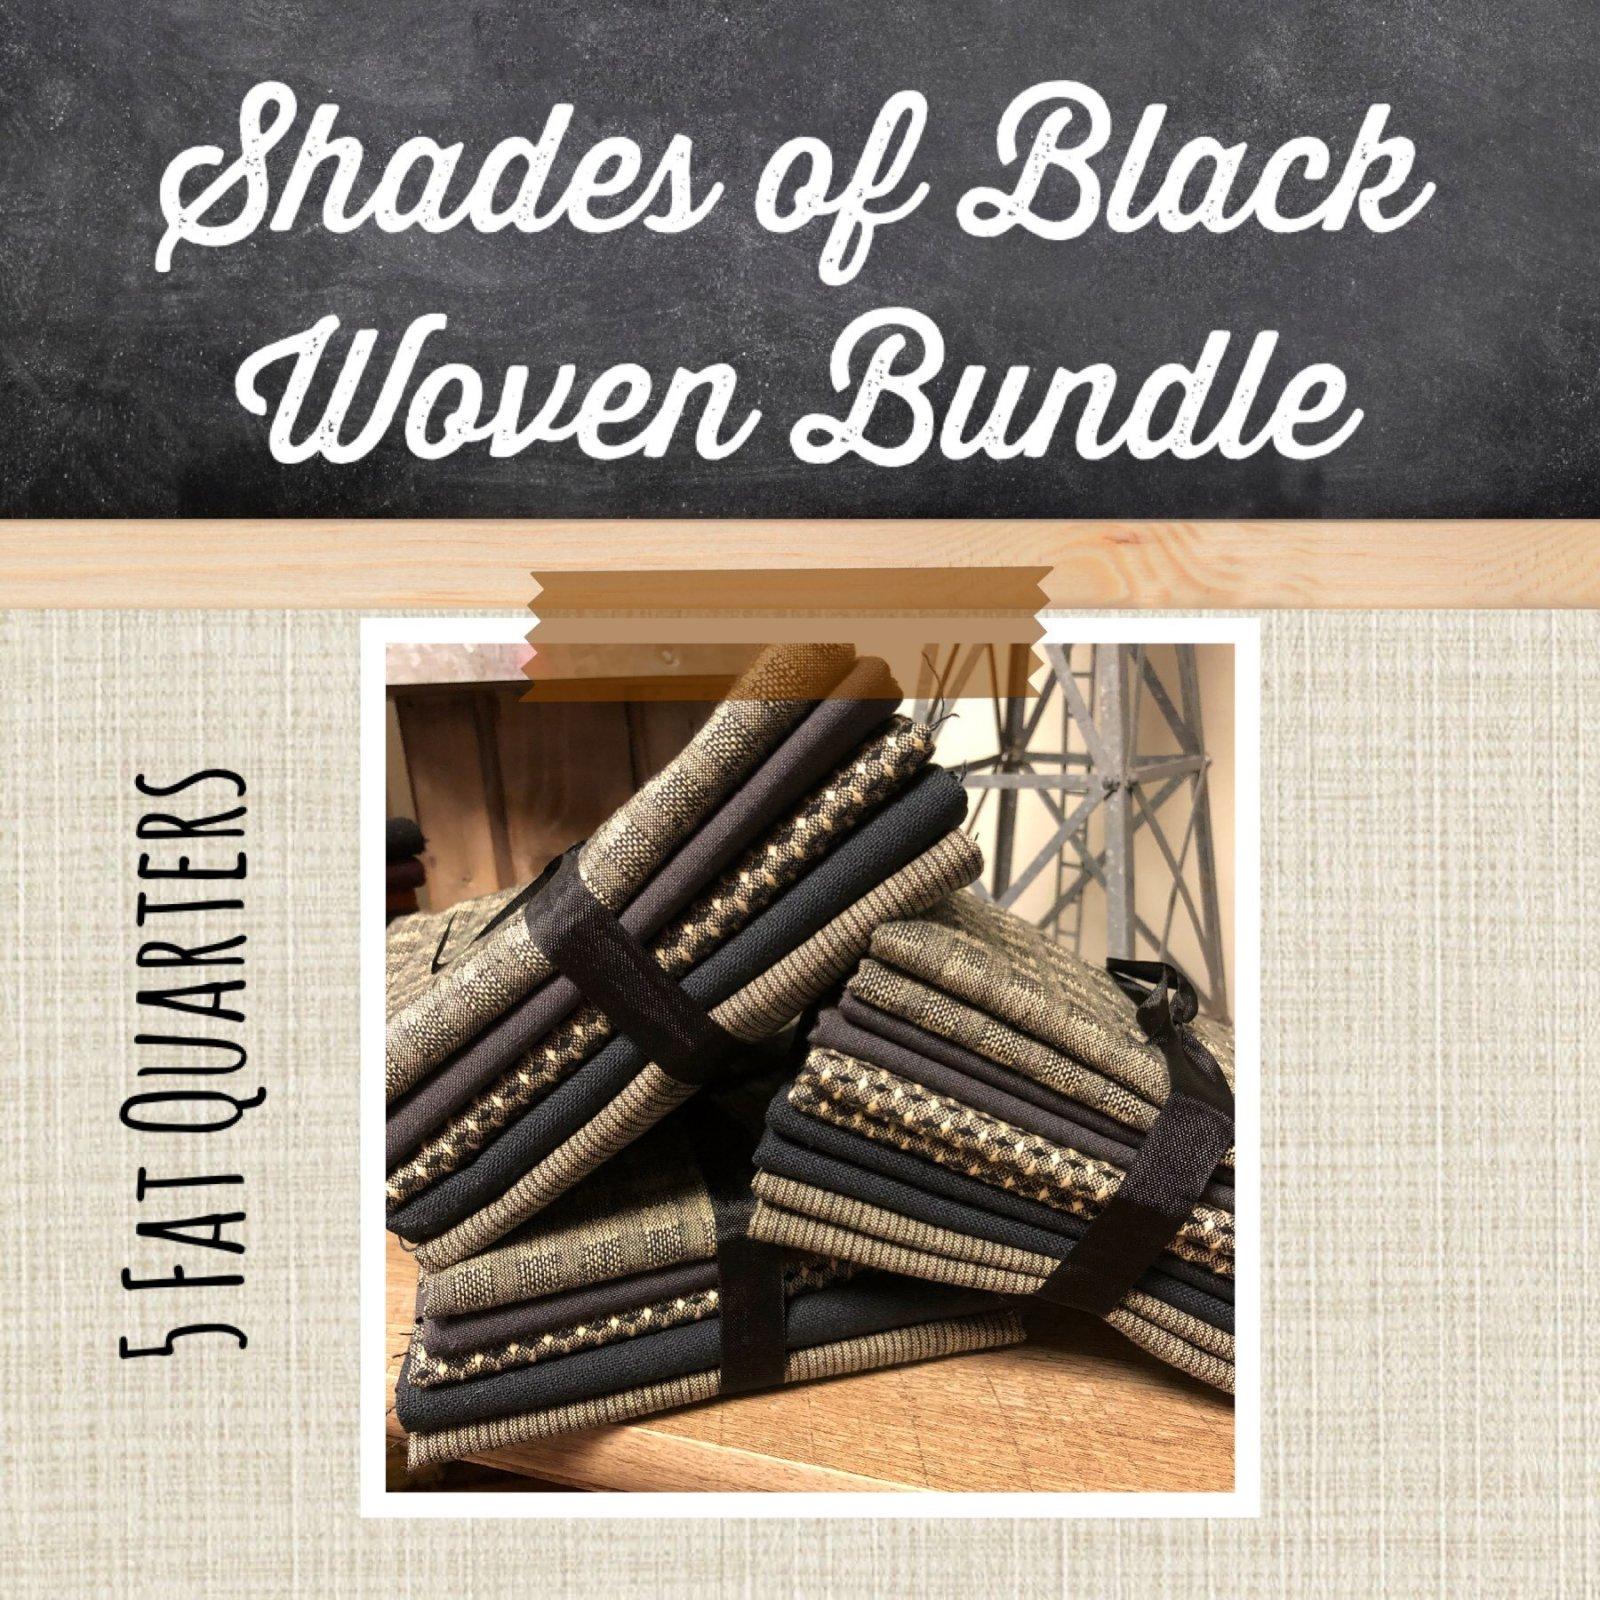 Shades of Black Woven Bundle